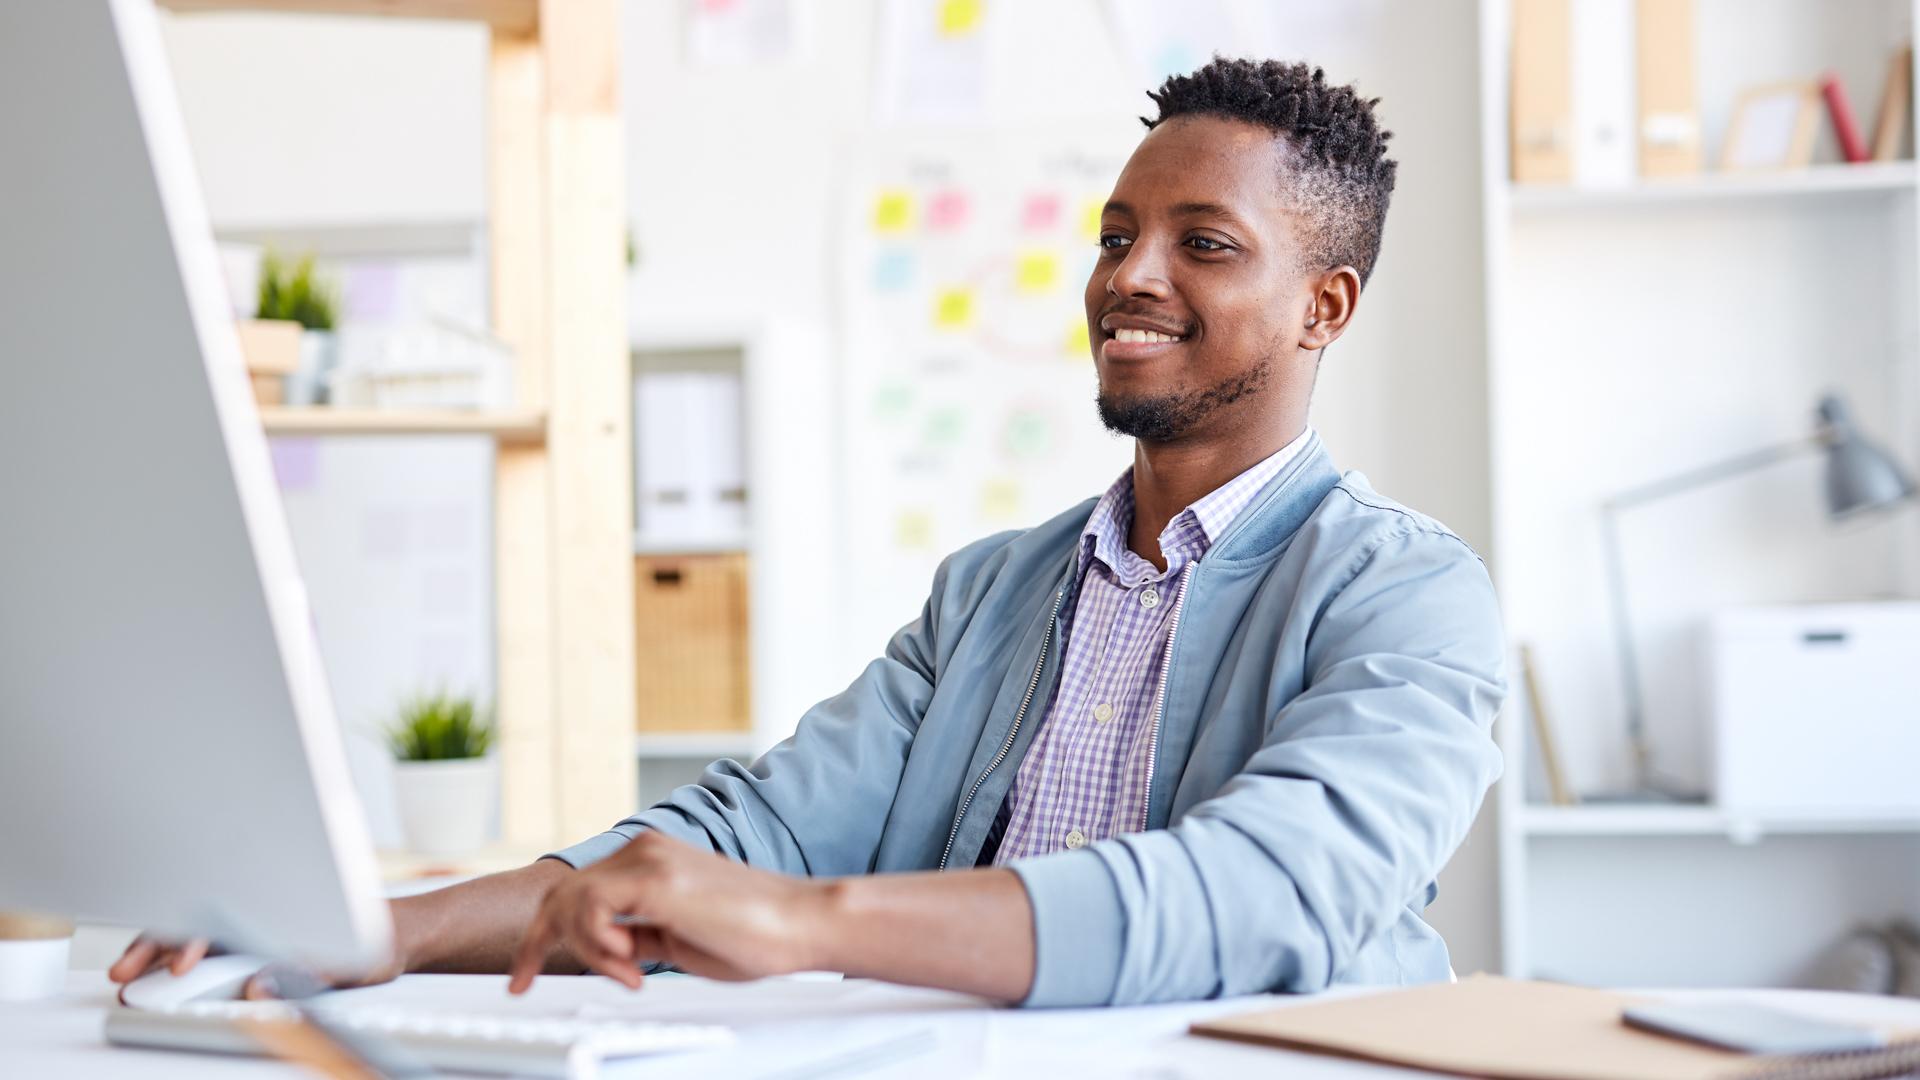 How To Make Money on Upwork, Freelance News, Freelancing Resources, Freelancing Platform, Freelancing Tips, Freelance Upwork